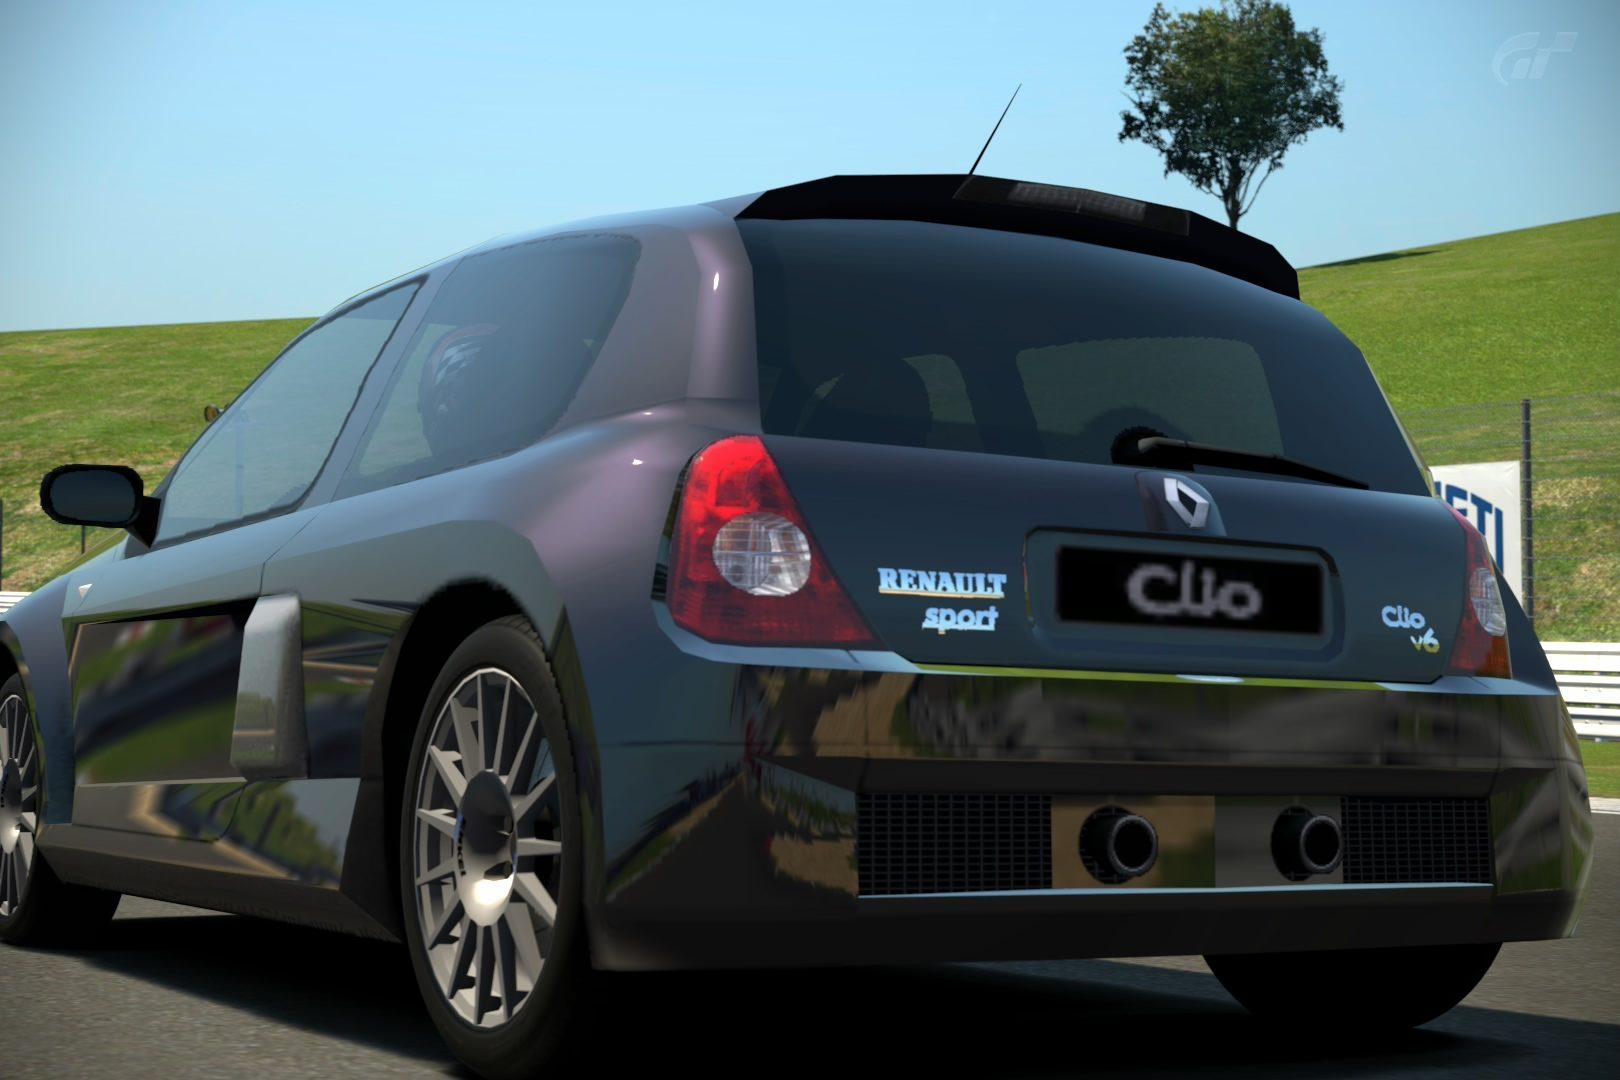 ClioV6Phase2.jpg